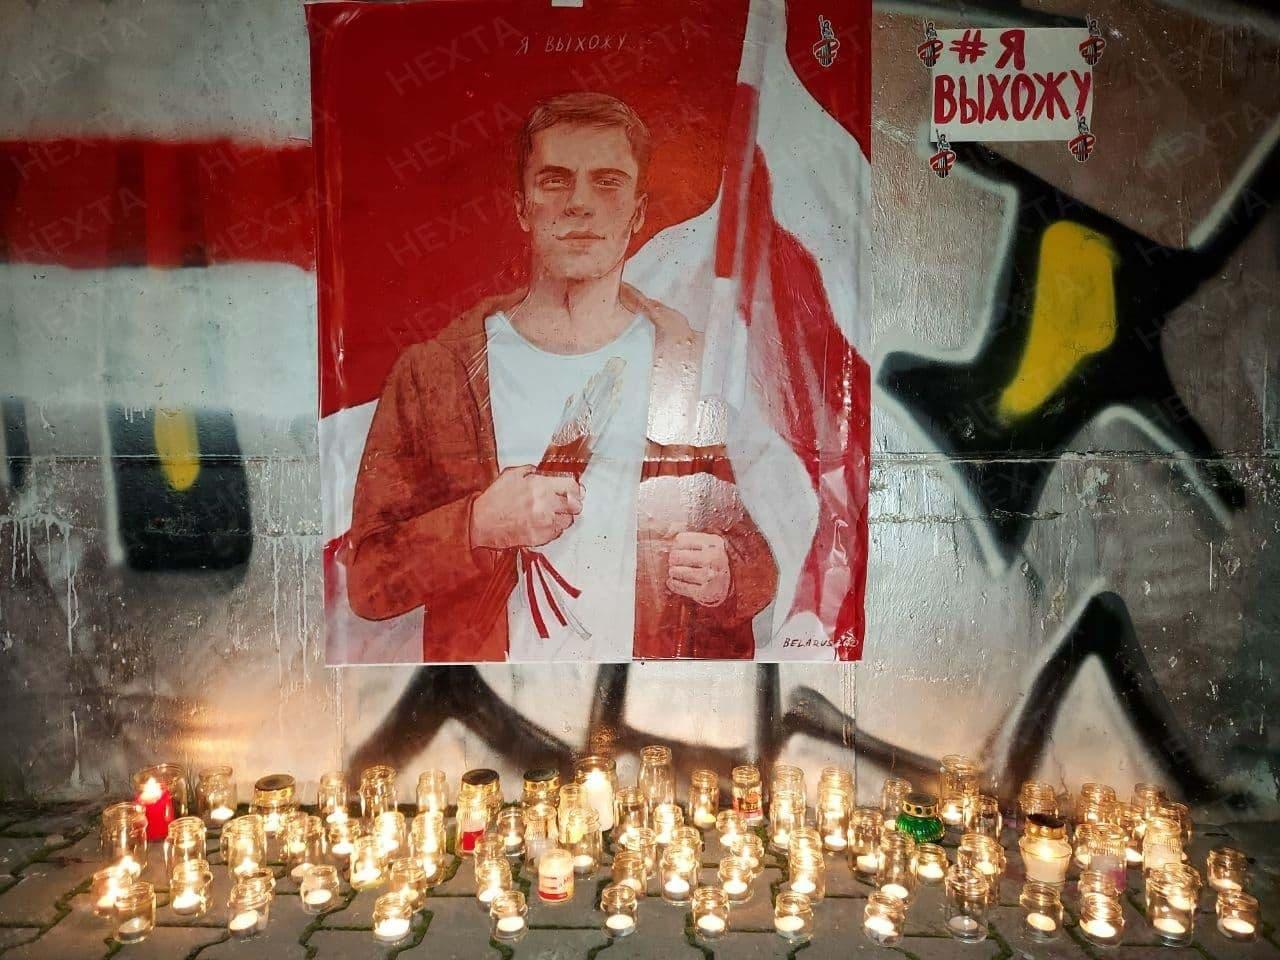 мемориал памяти Бондаренко